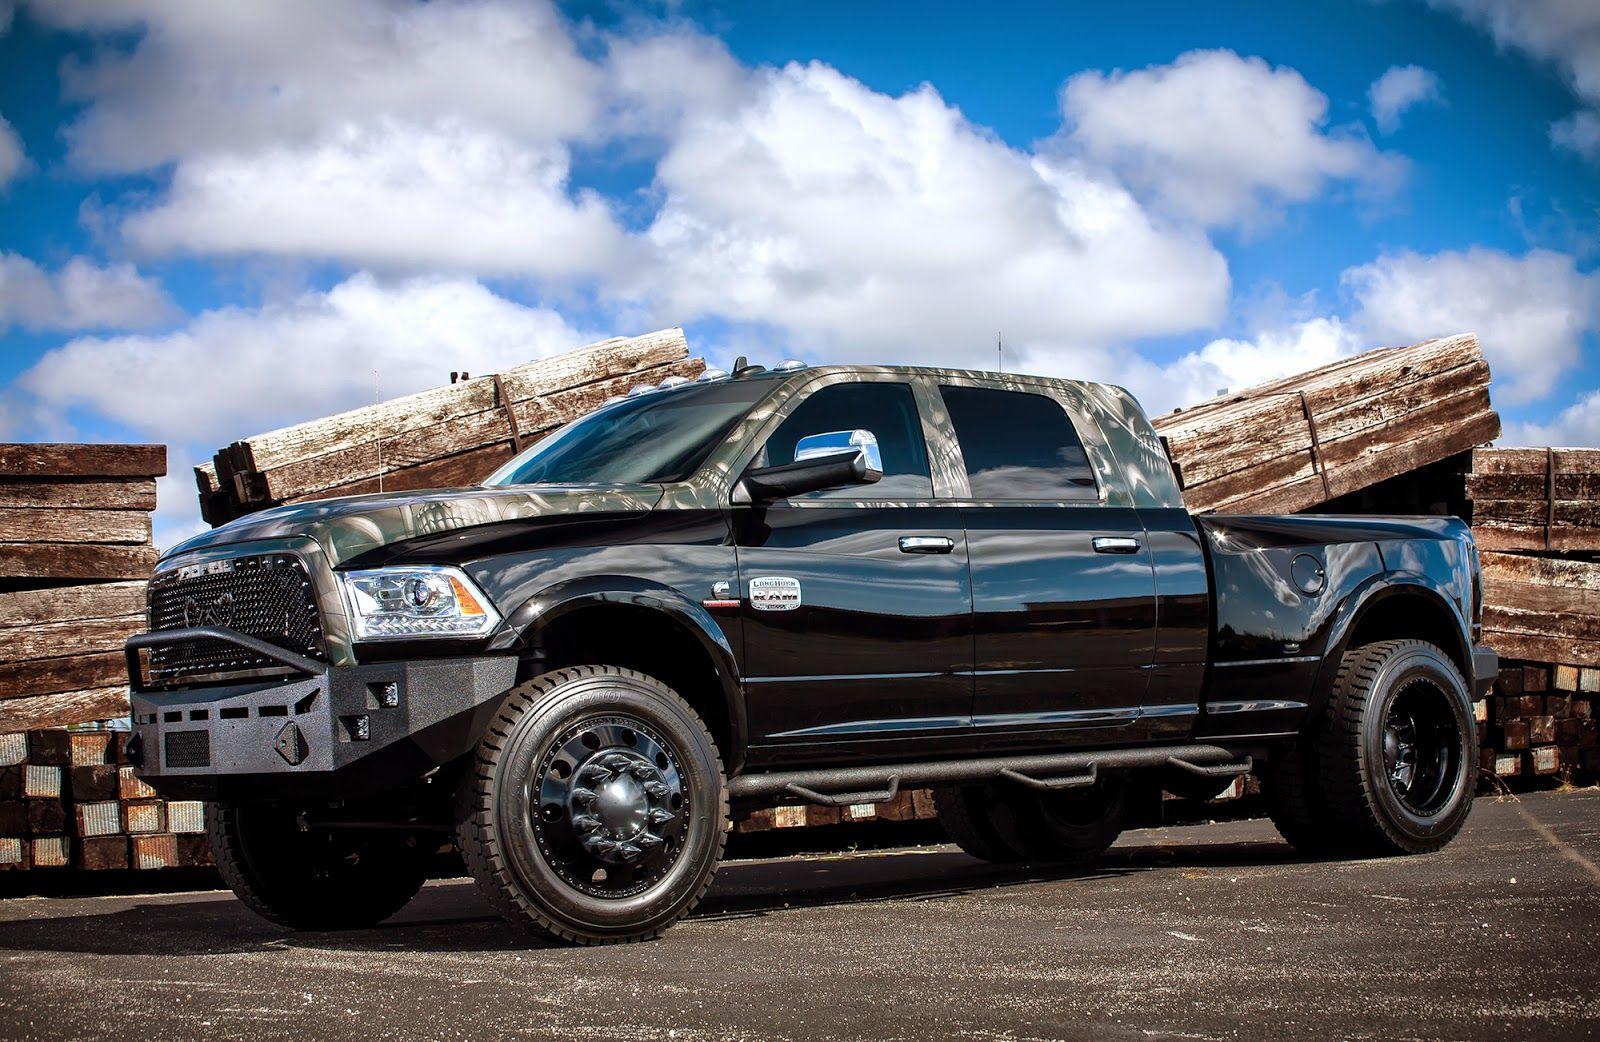 exclusive motoring dodge ram longhorn 3500 dually by american trucks pinterest dodge. Black Bedroom Furniture Sets. Home Design Ideas